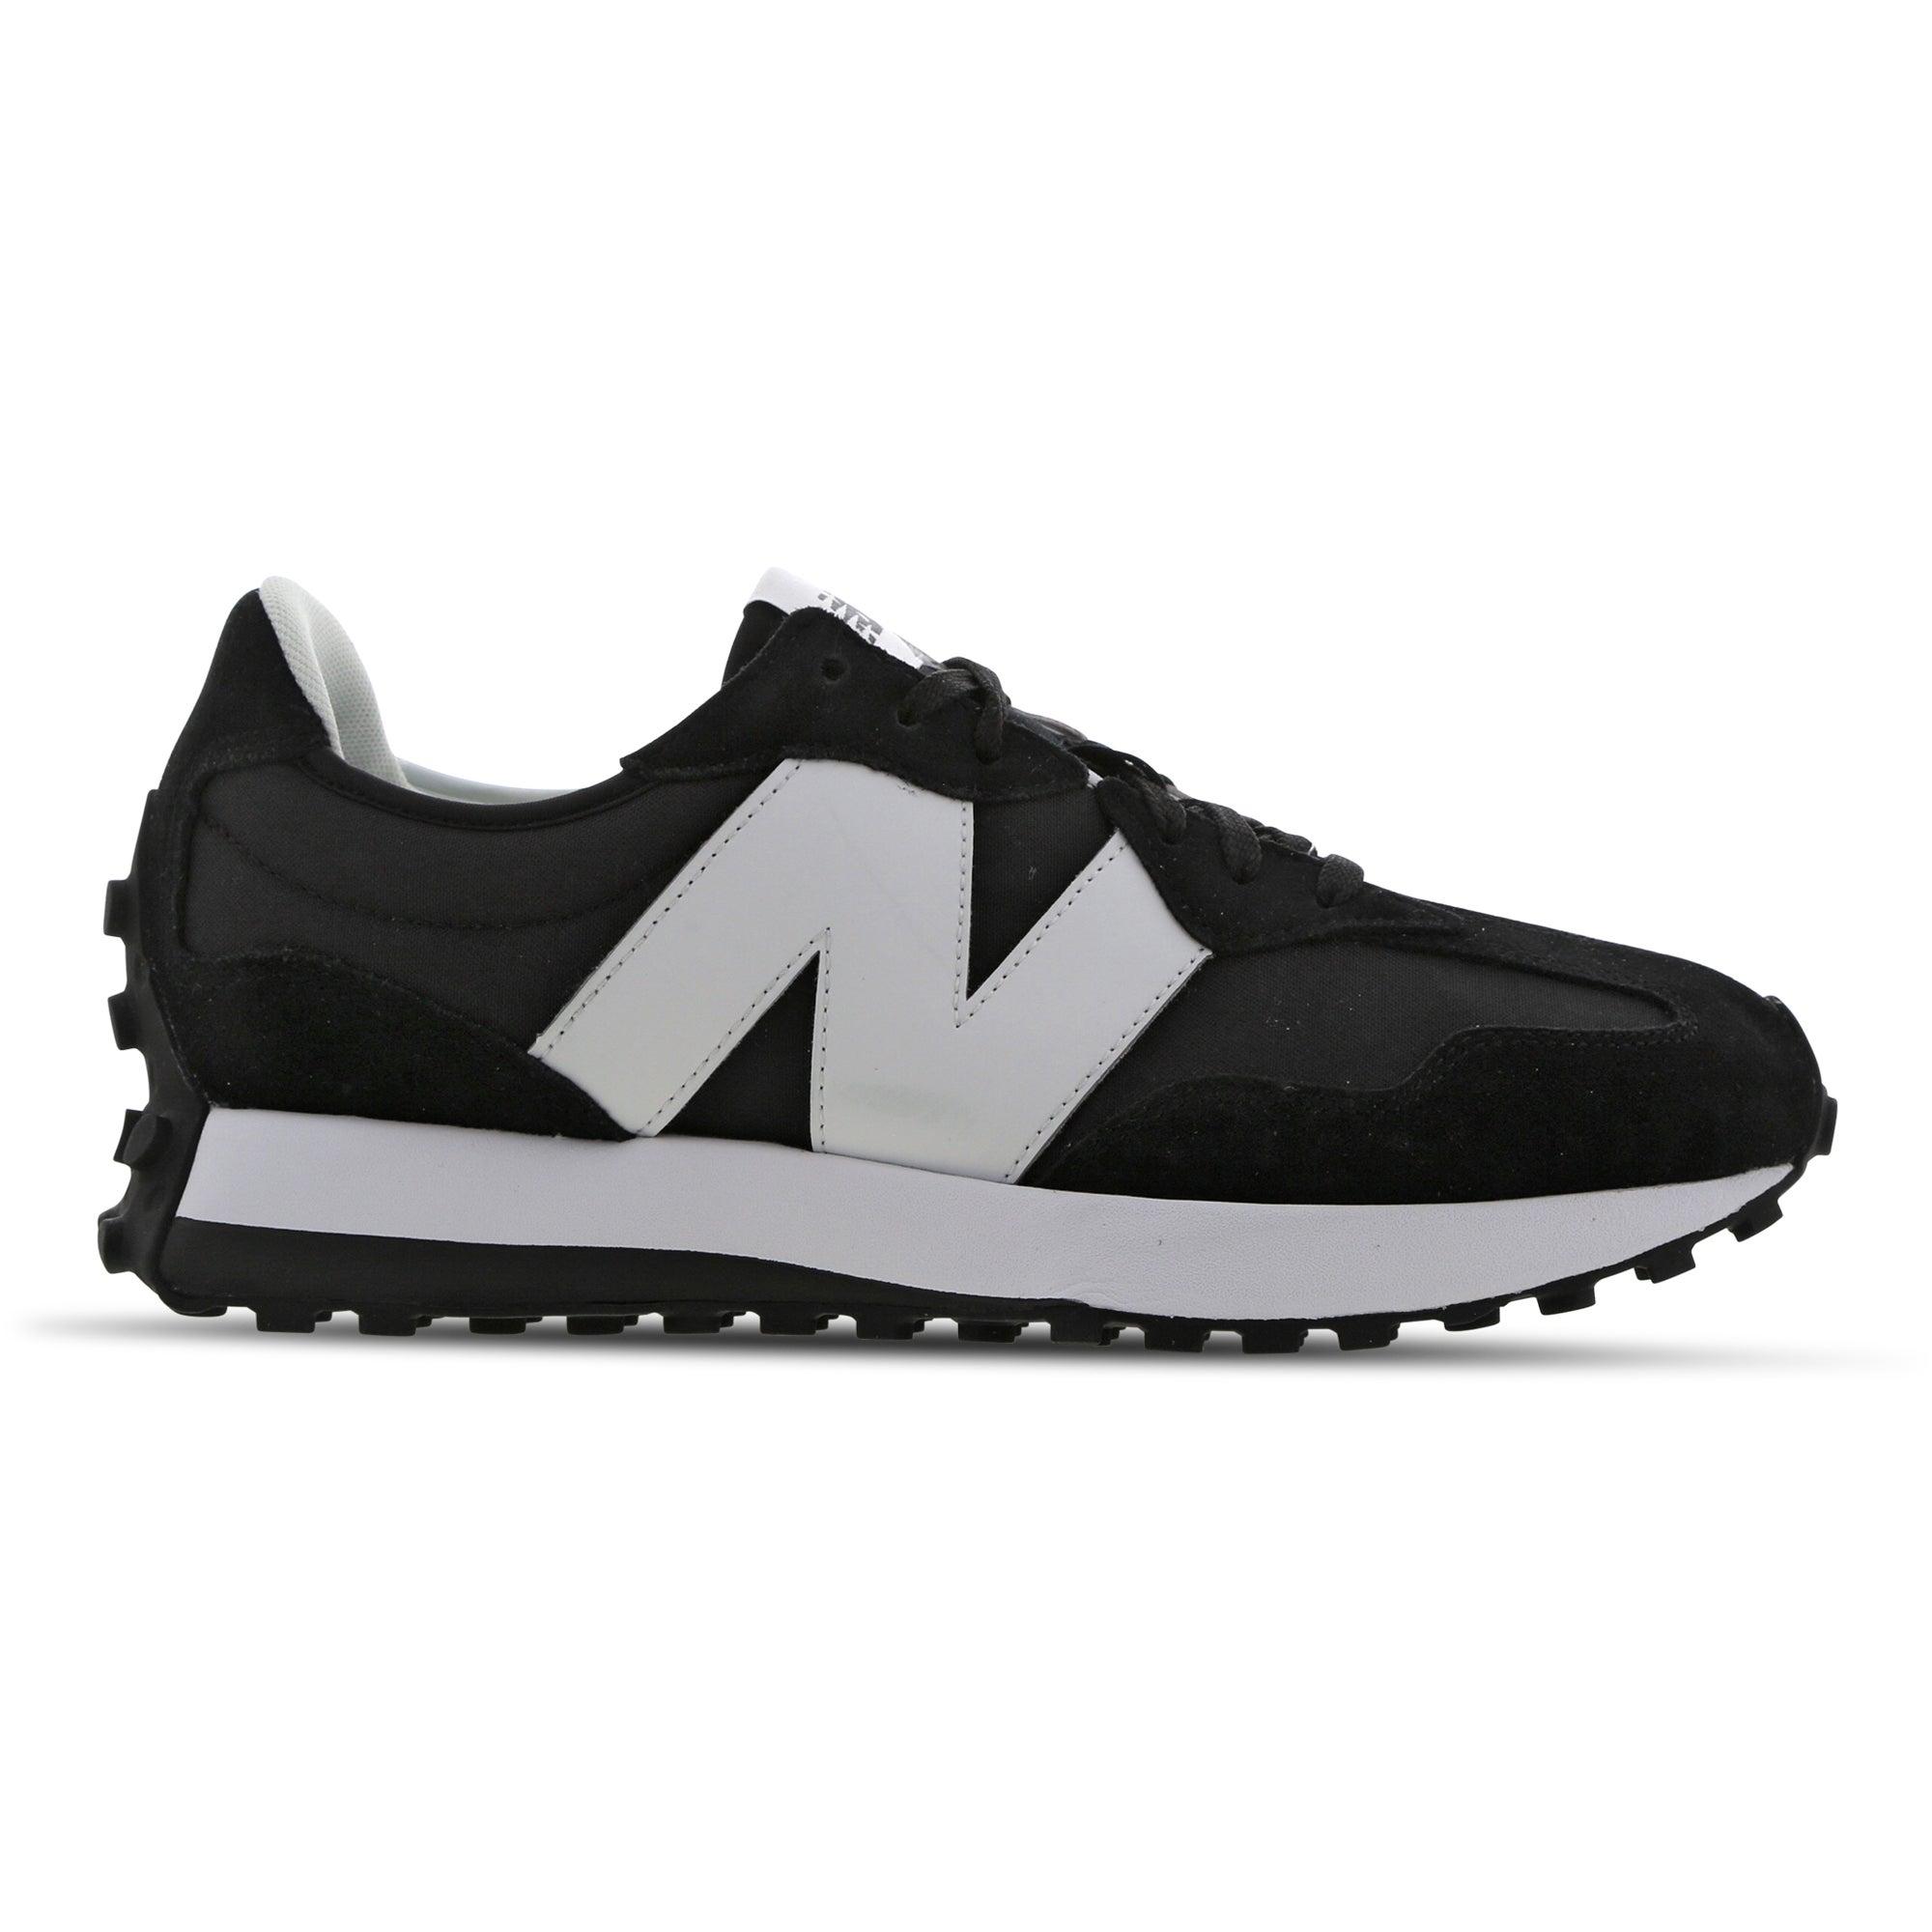 New Balance 327 Schuhe